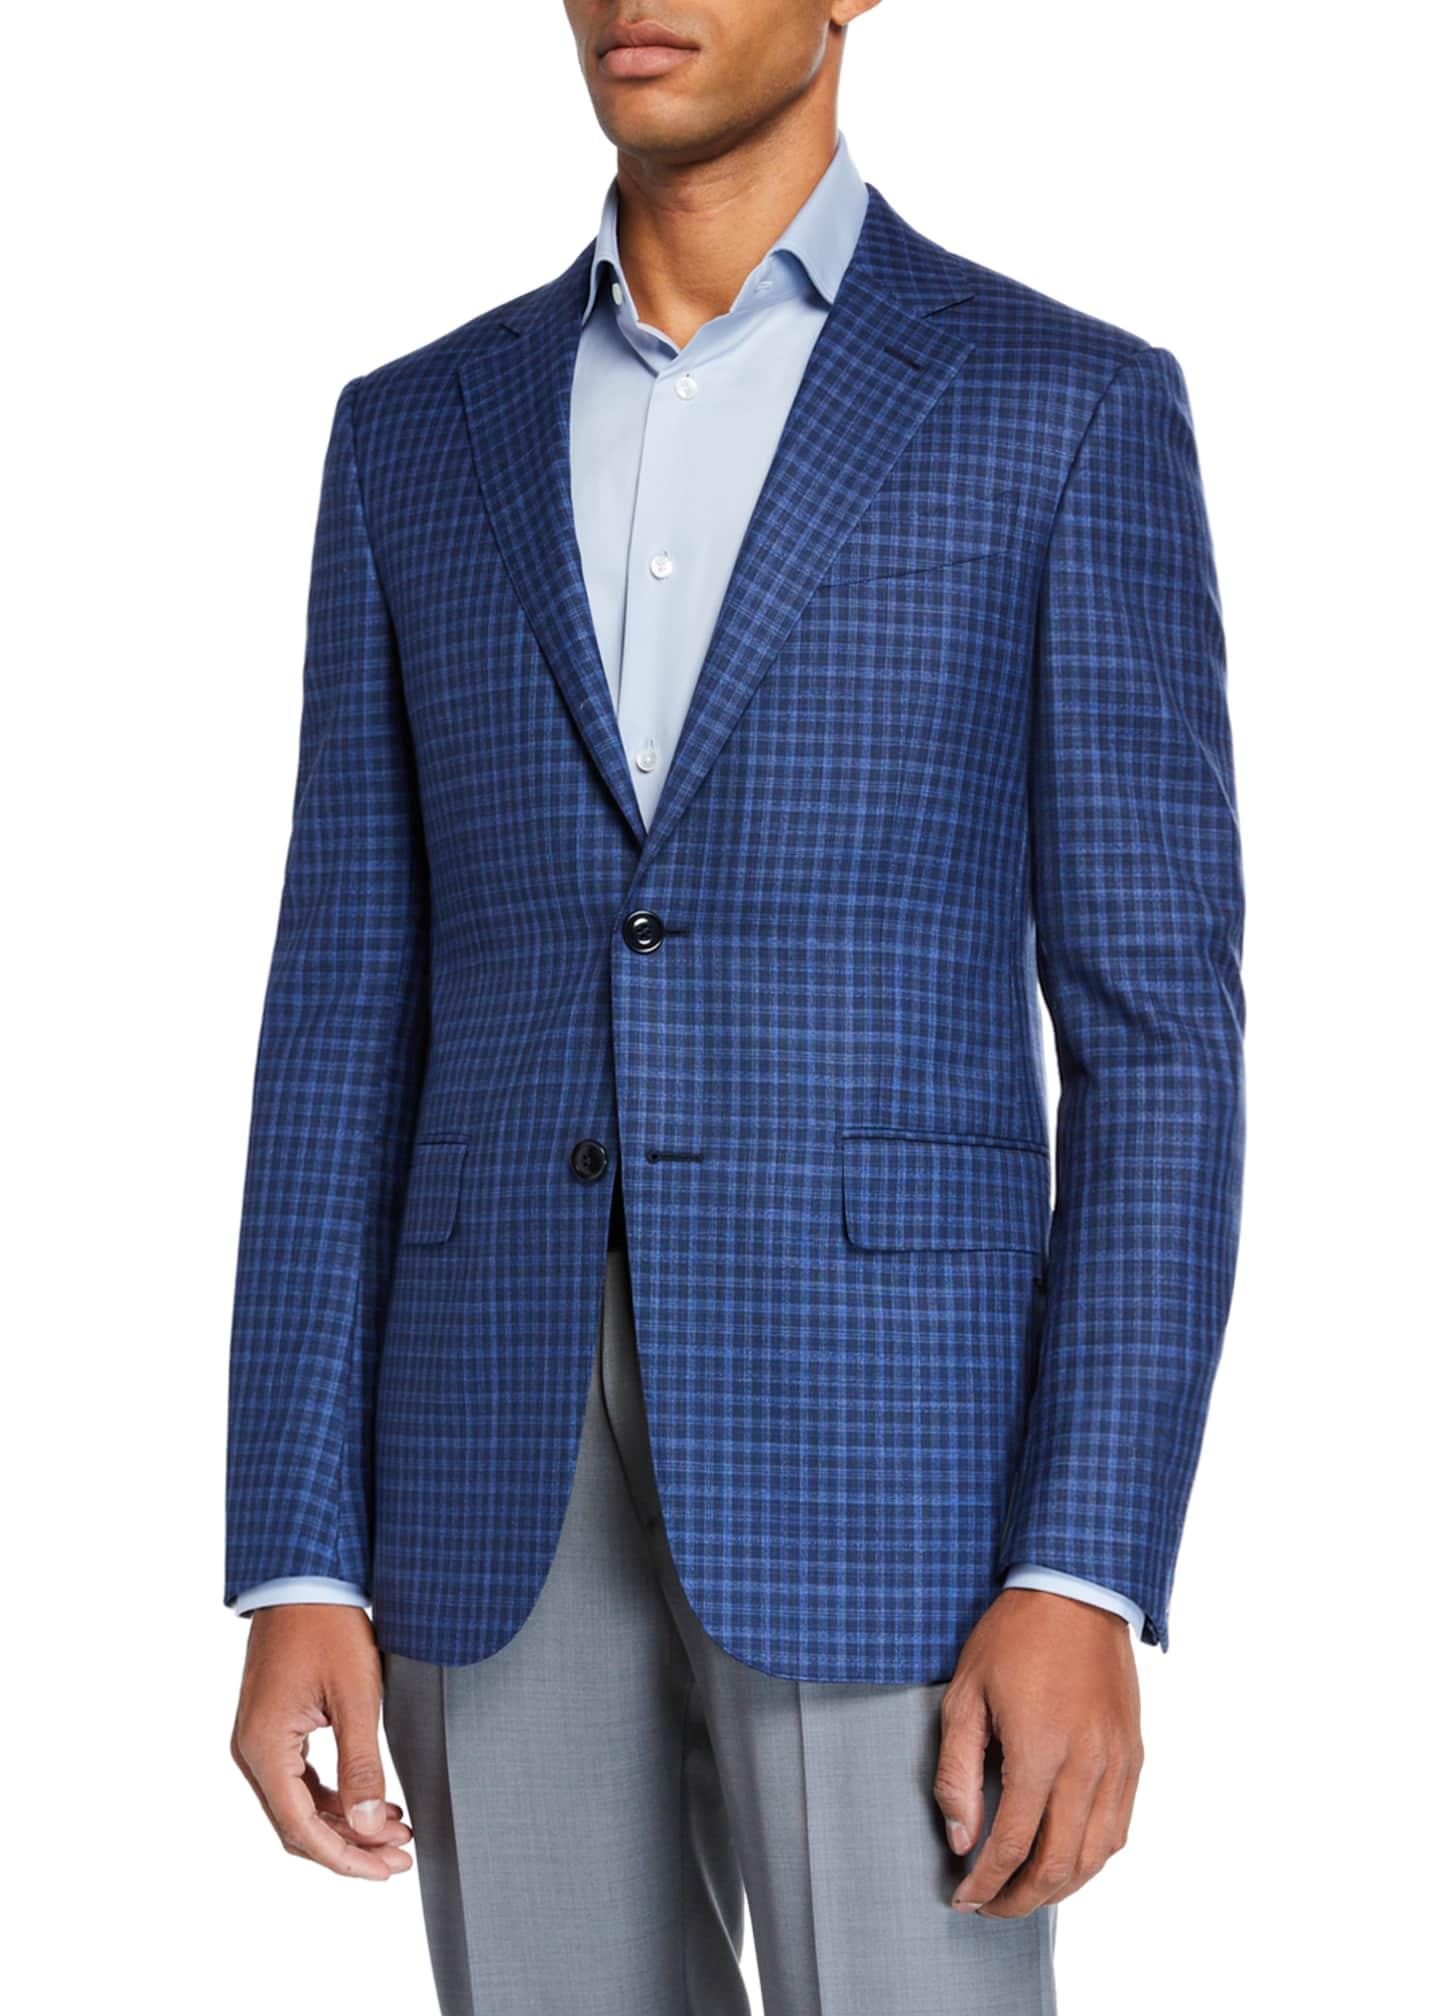 Ermenegildo Zegna Men's Gingham Check Wool Two-Button Jacket